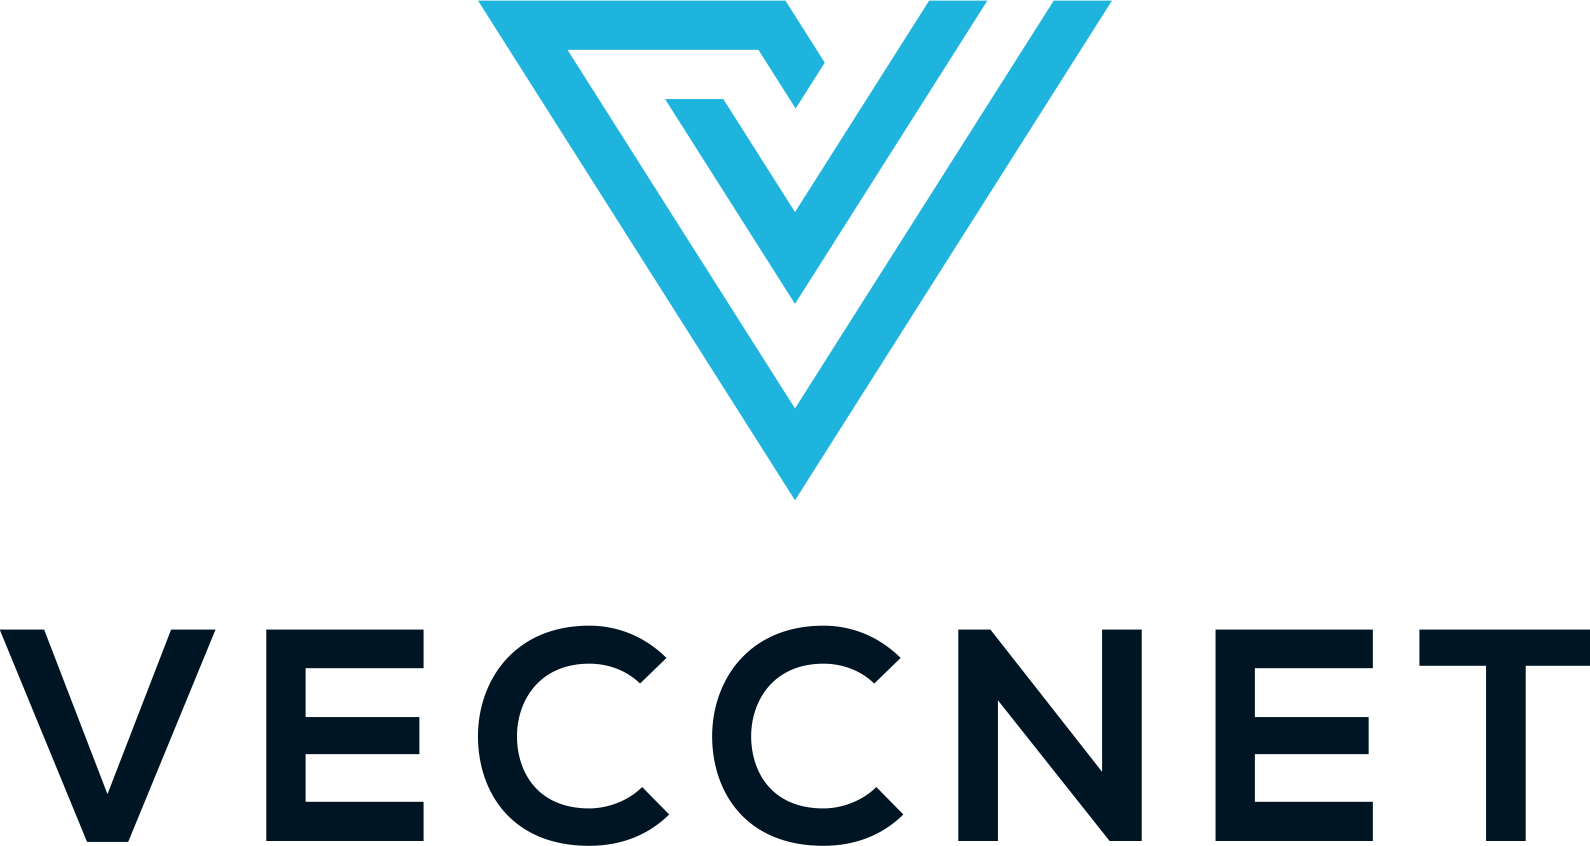 Veccnet